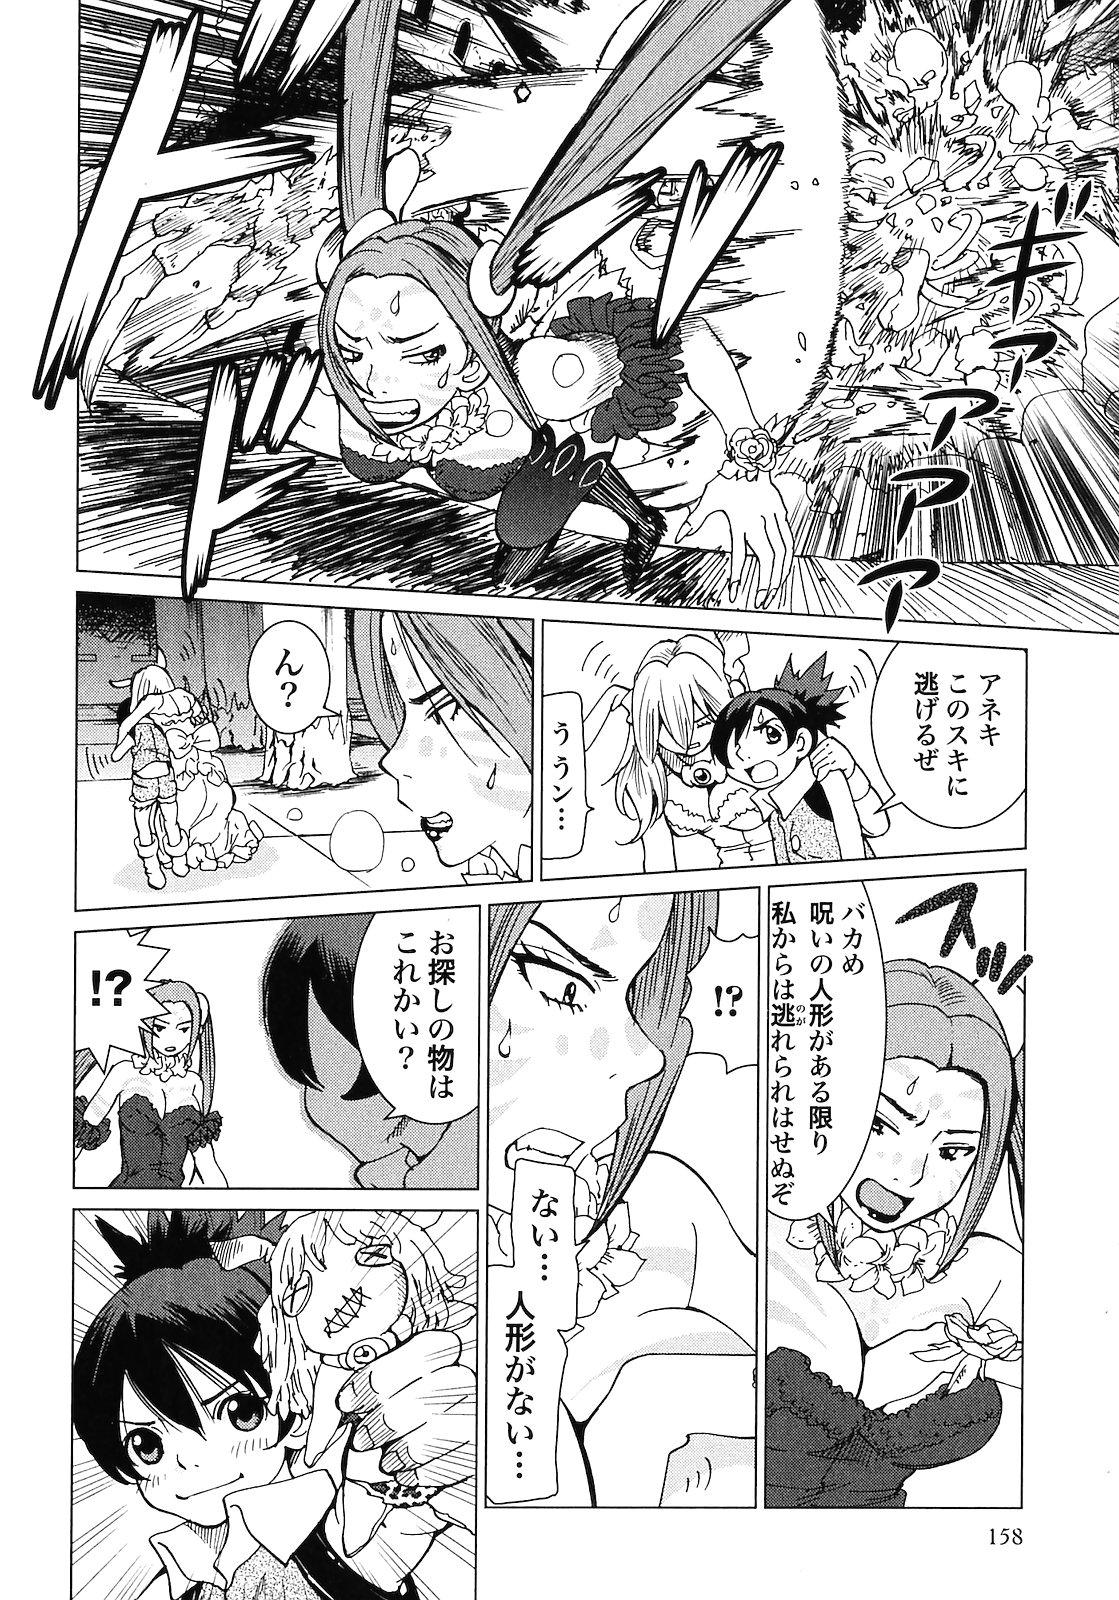 Makyo no Shanana Vol.02 159